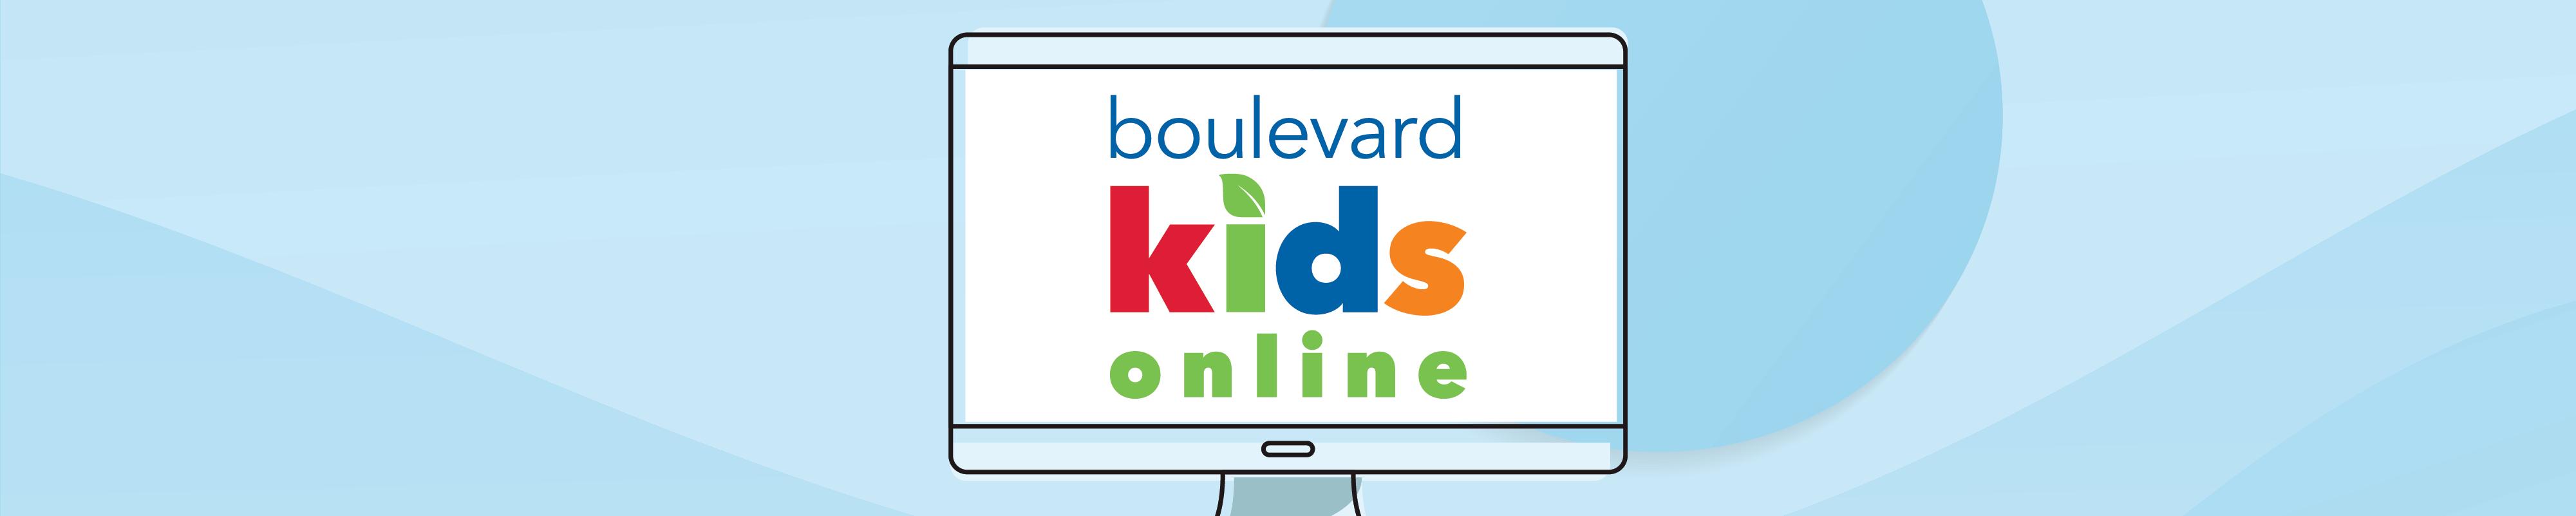 Boulevard Kids Online